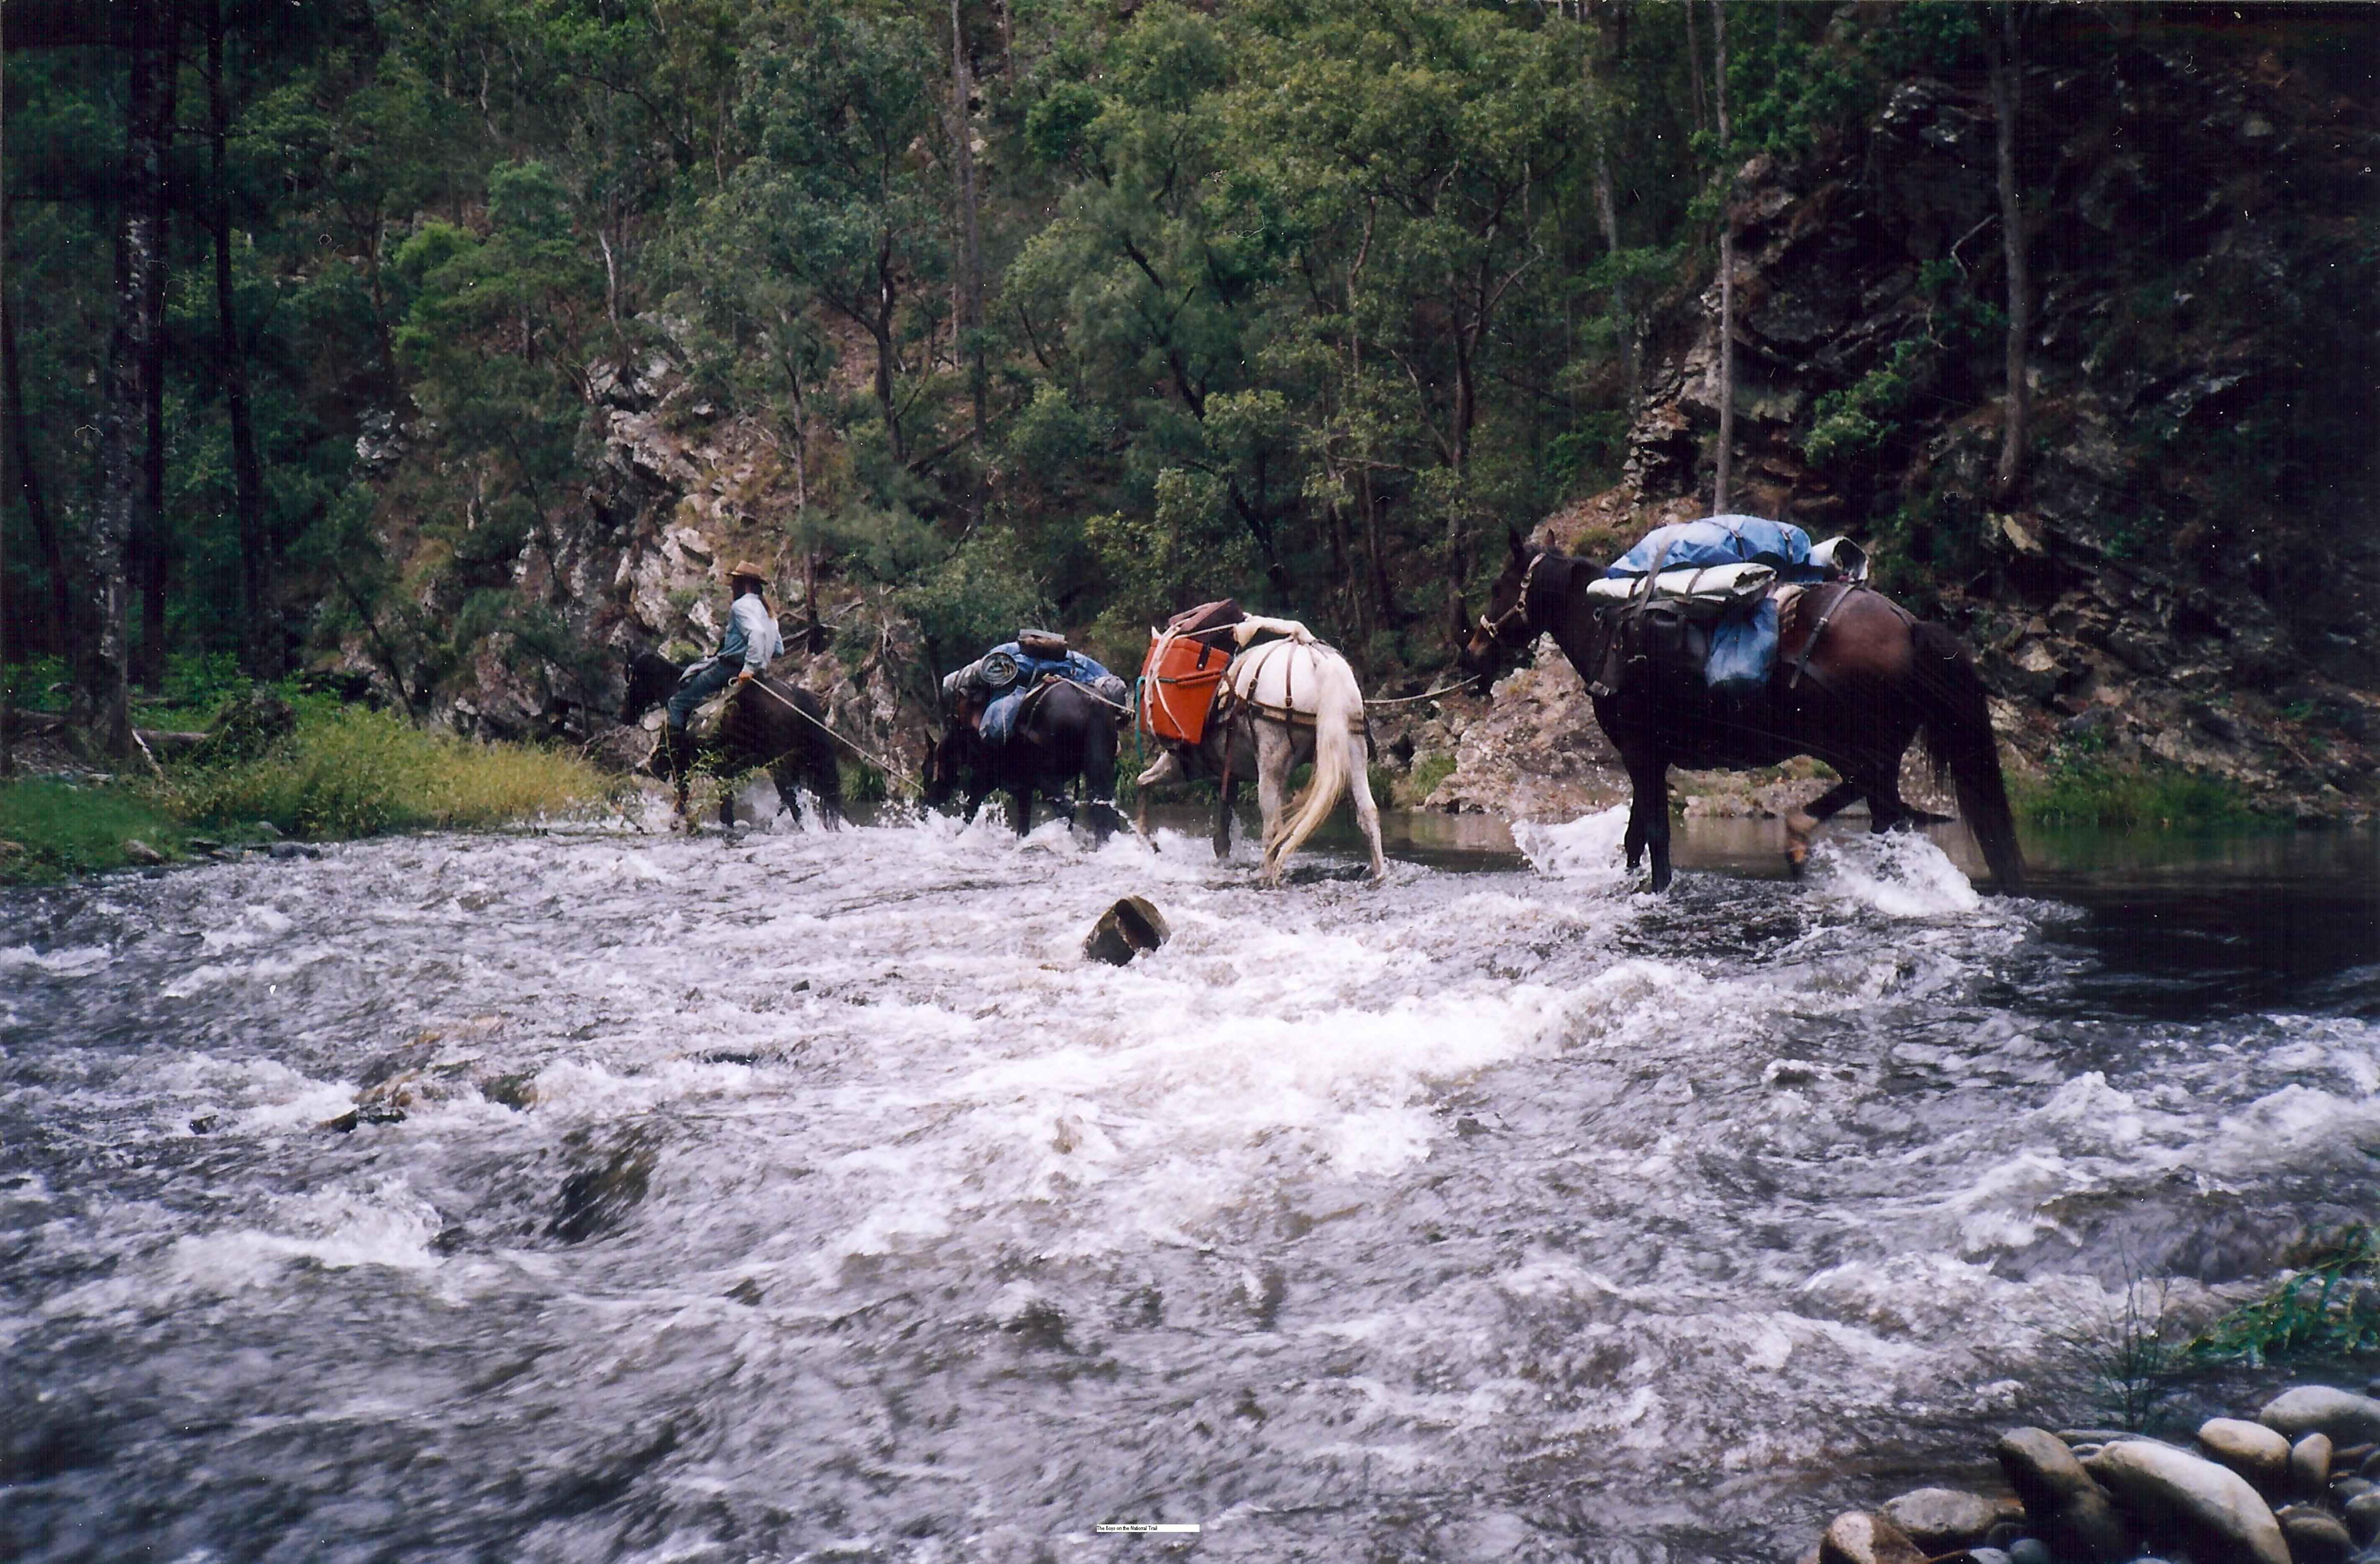 Bicentennial National Trail - Wikipedia